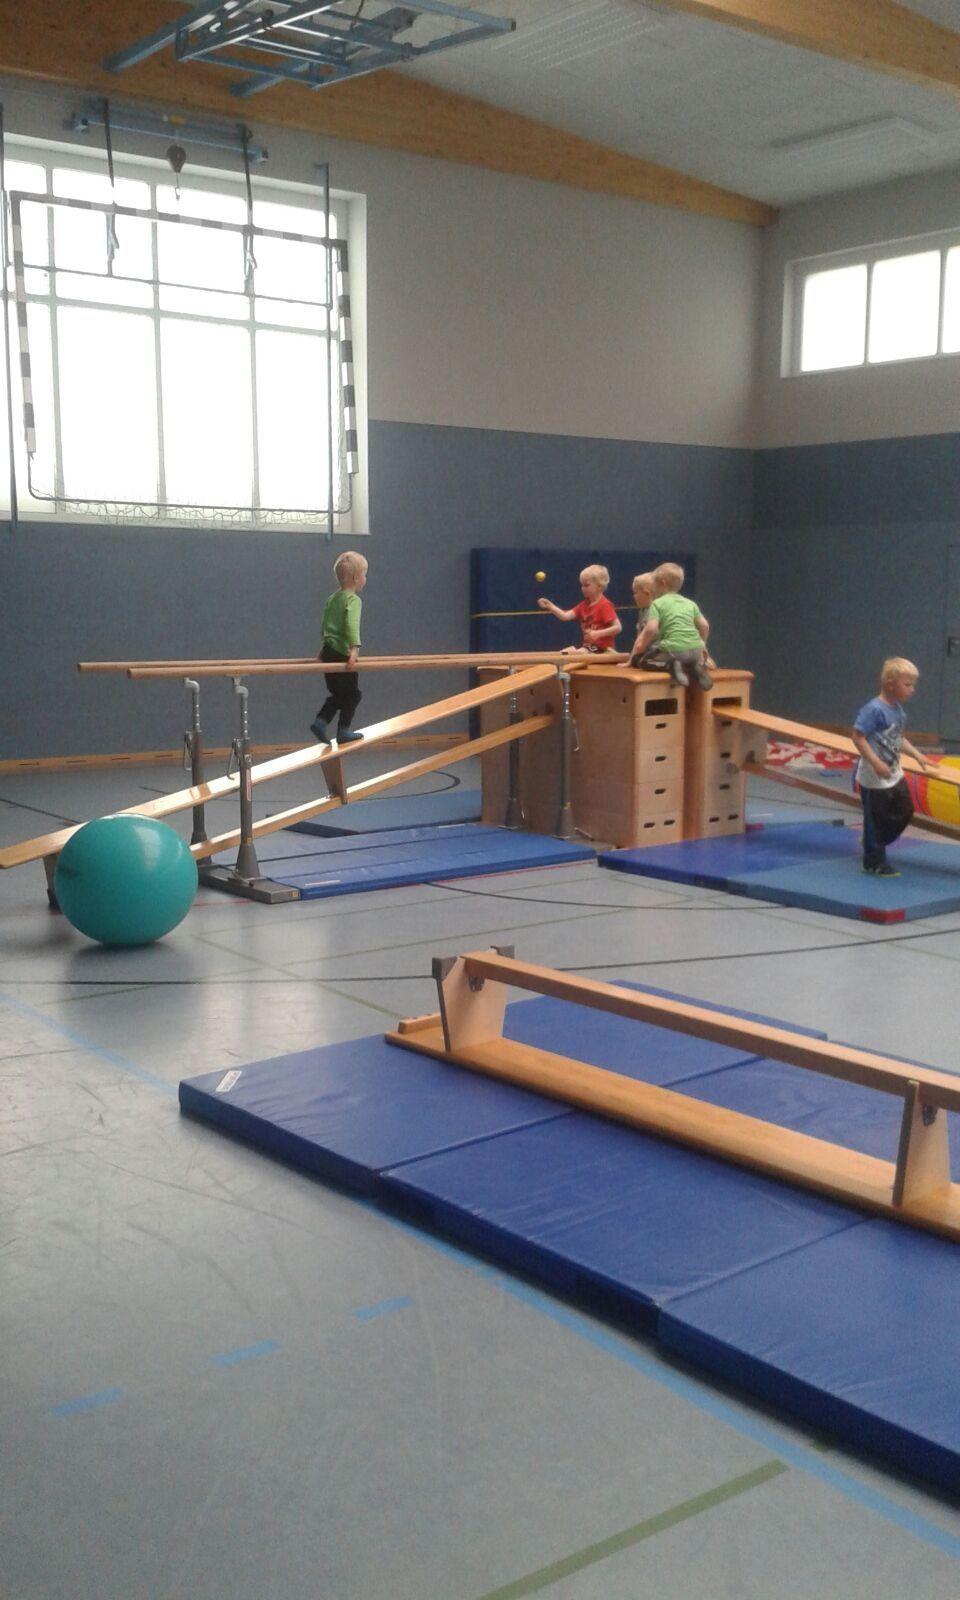 Ähnliches Foto | Tělocvična a hry | Turnen mit kindern ...